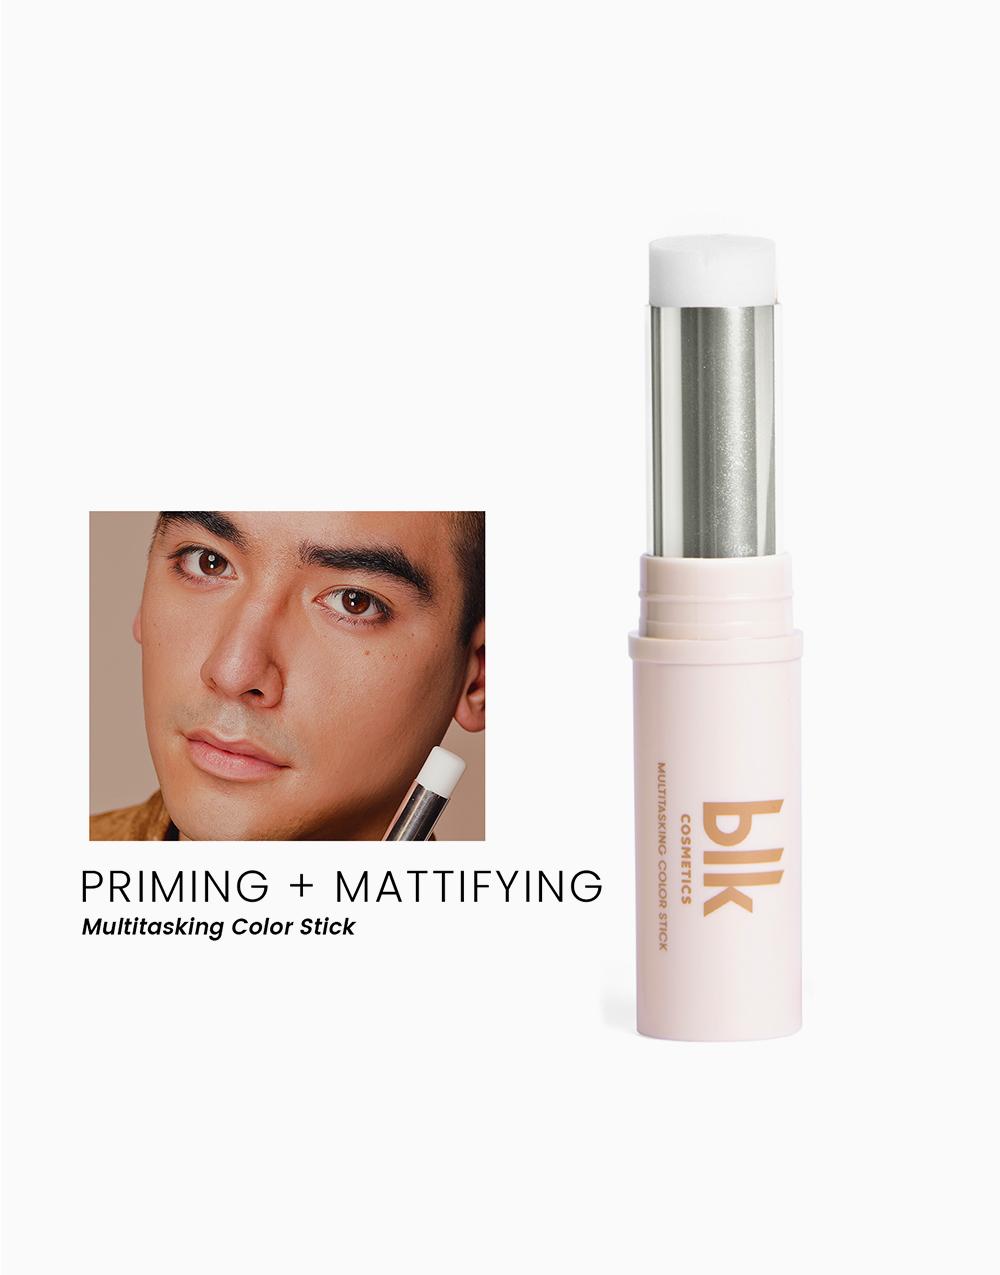 Multitasking Color Stick Priming + Mattifying Stick by BLK Cosmetics